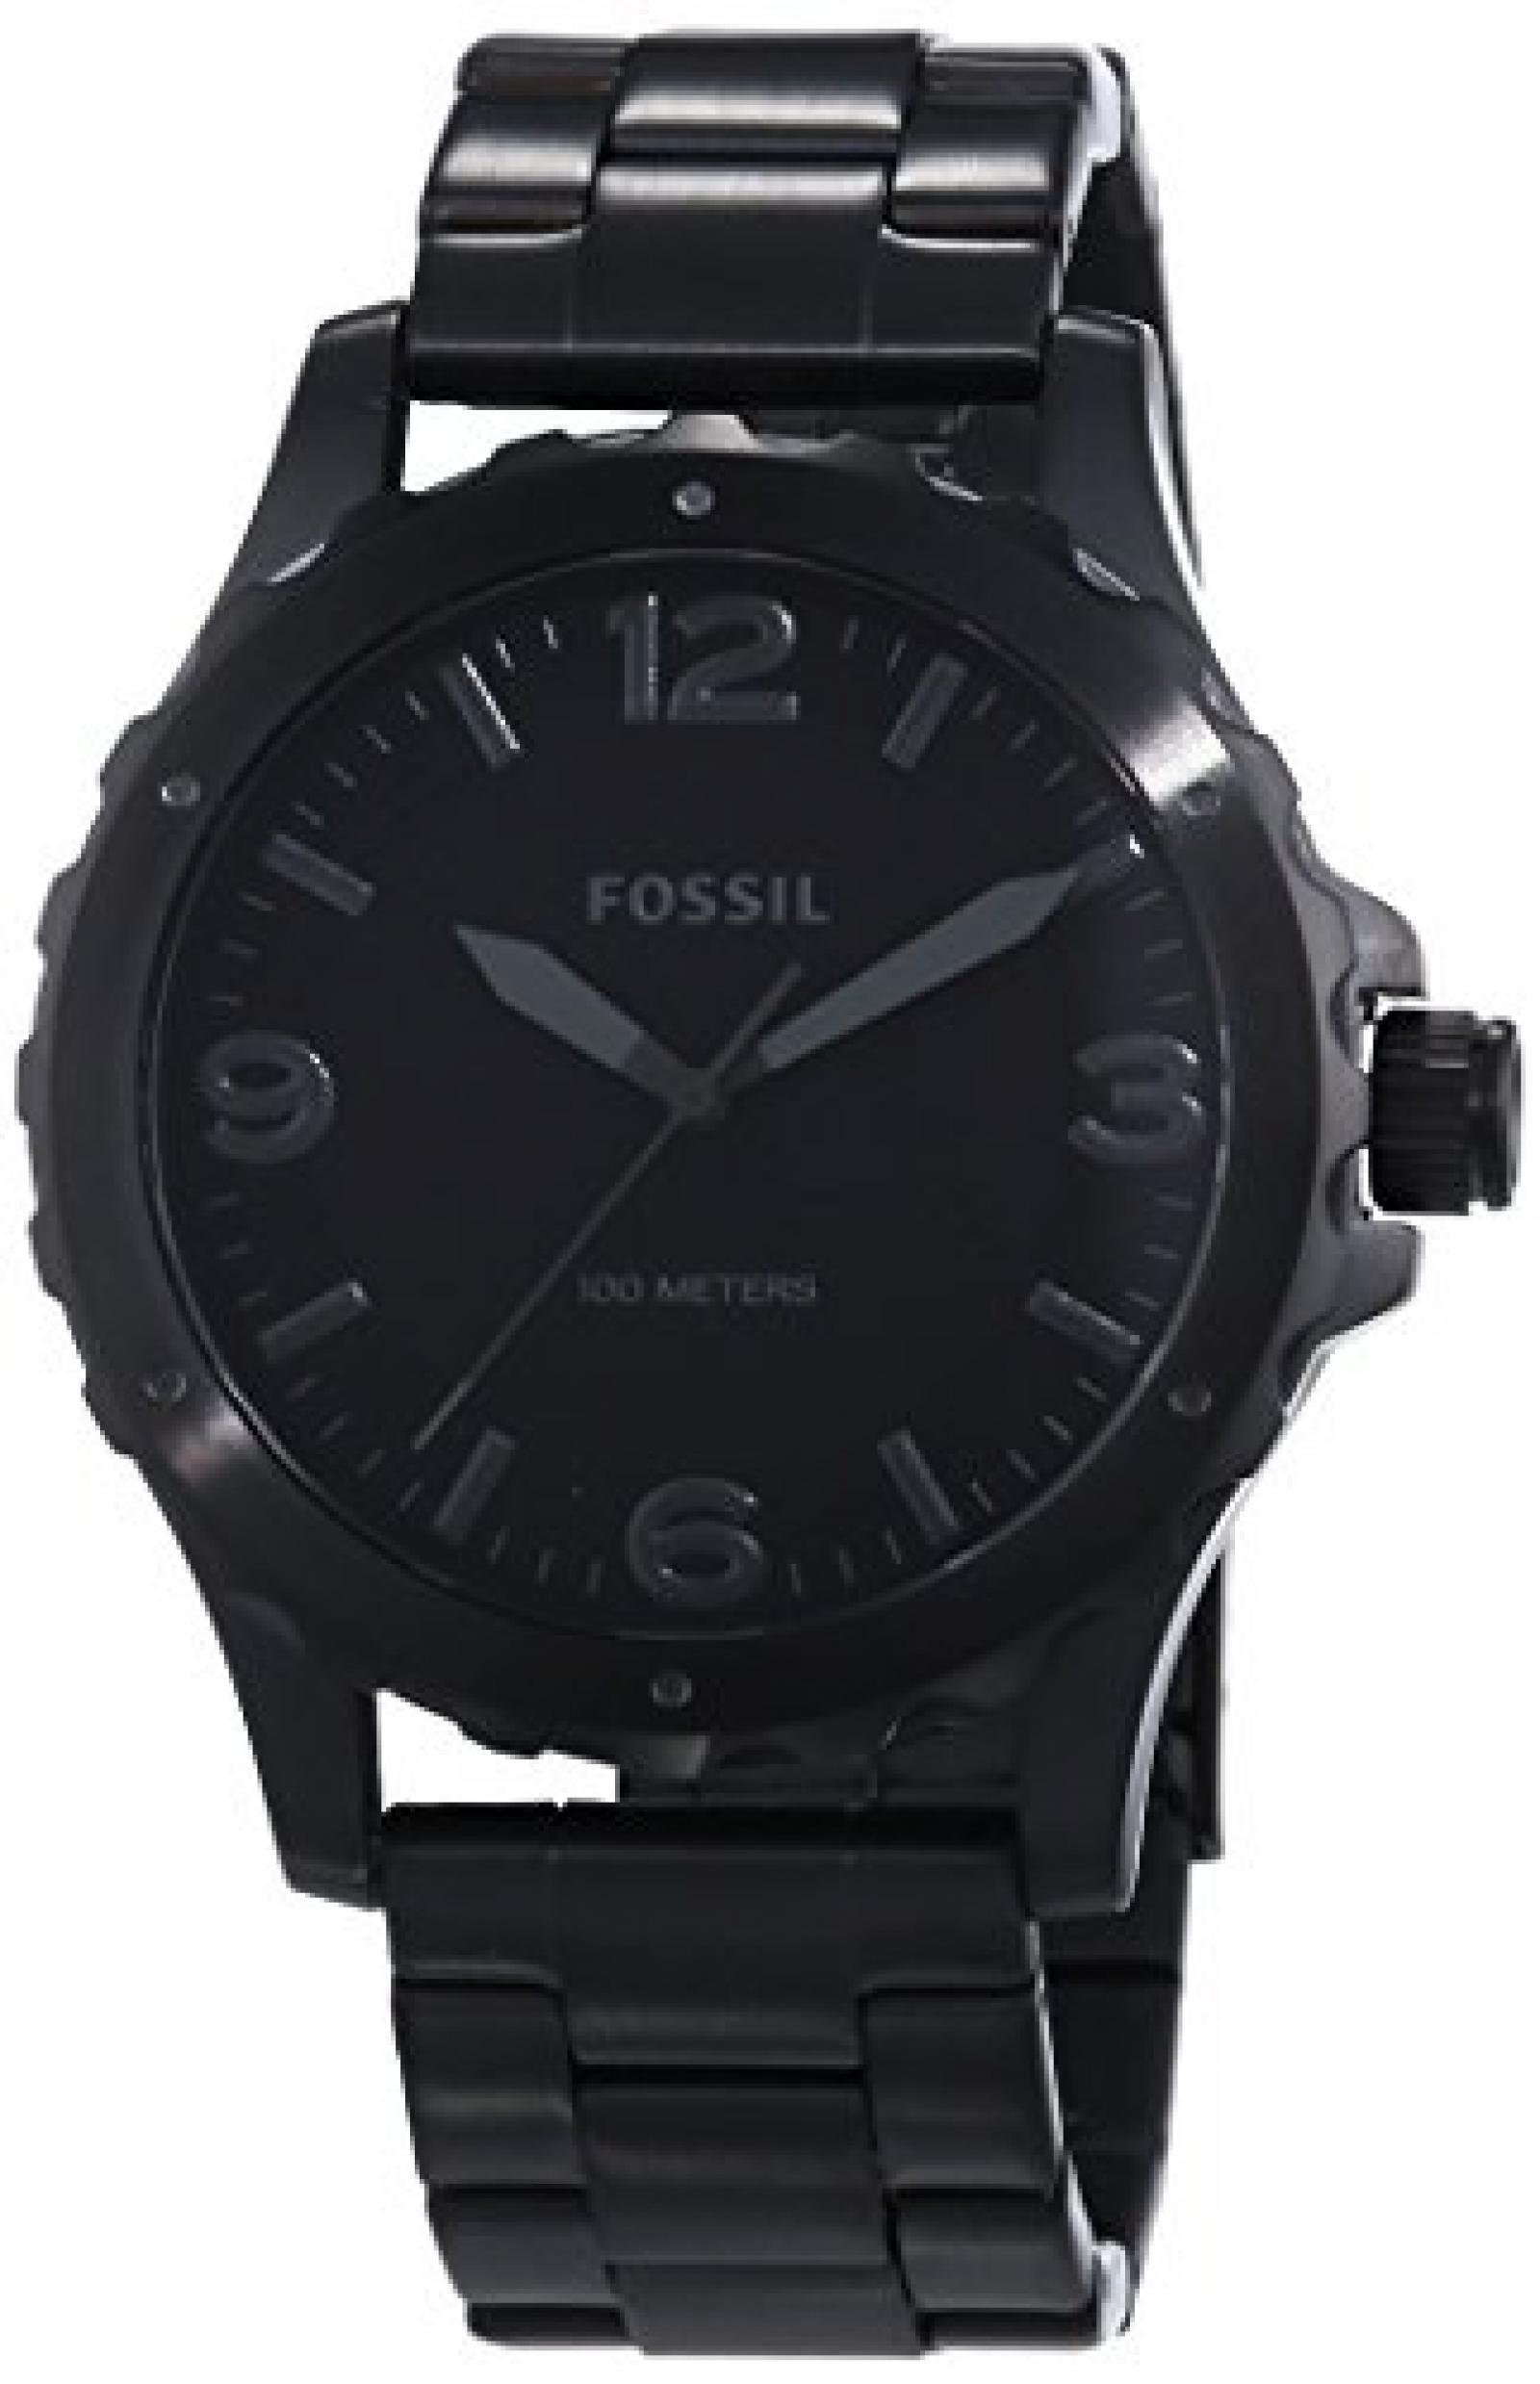 Fossil Herren-Armbanduhr XL Analog Quarz Edelstahl JR1458